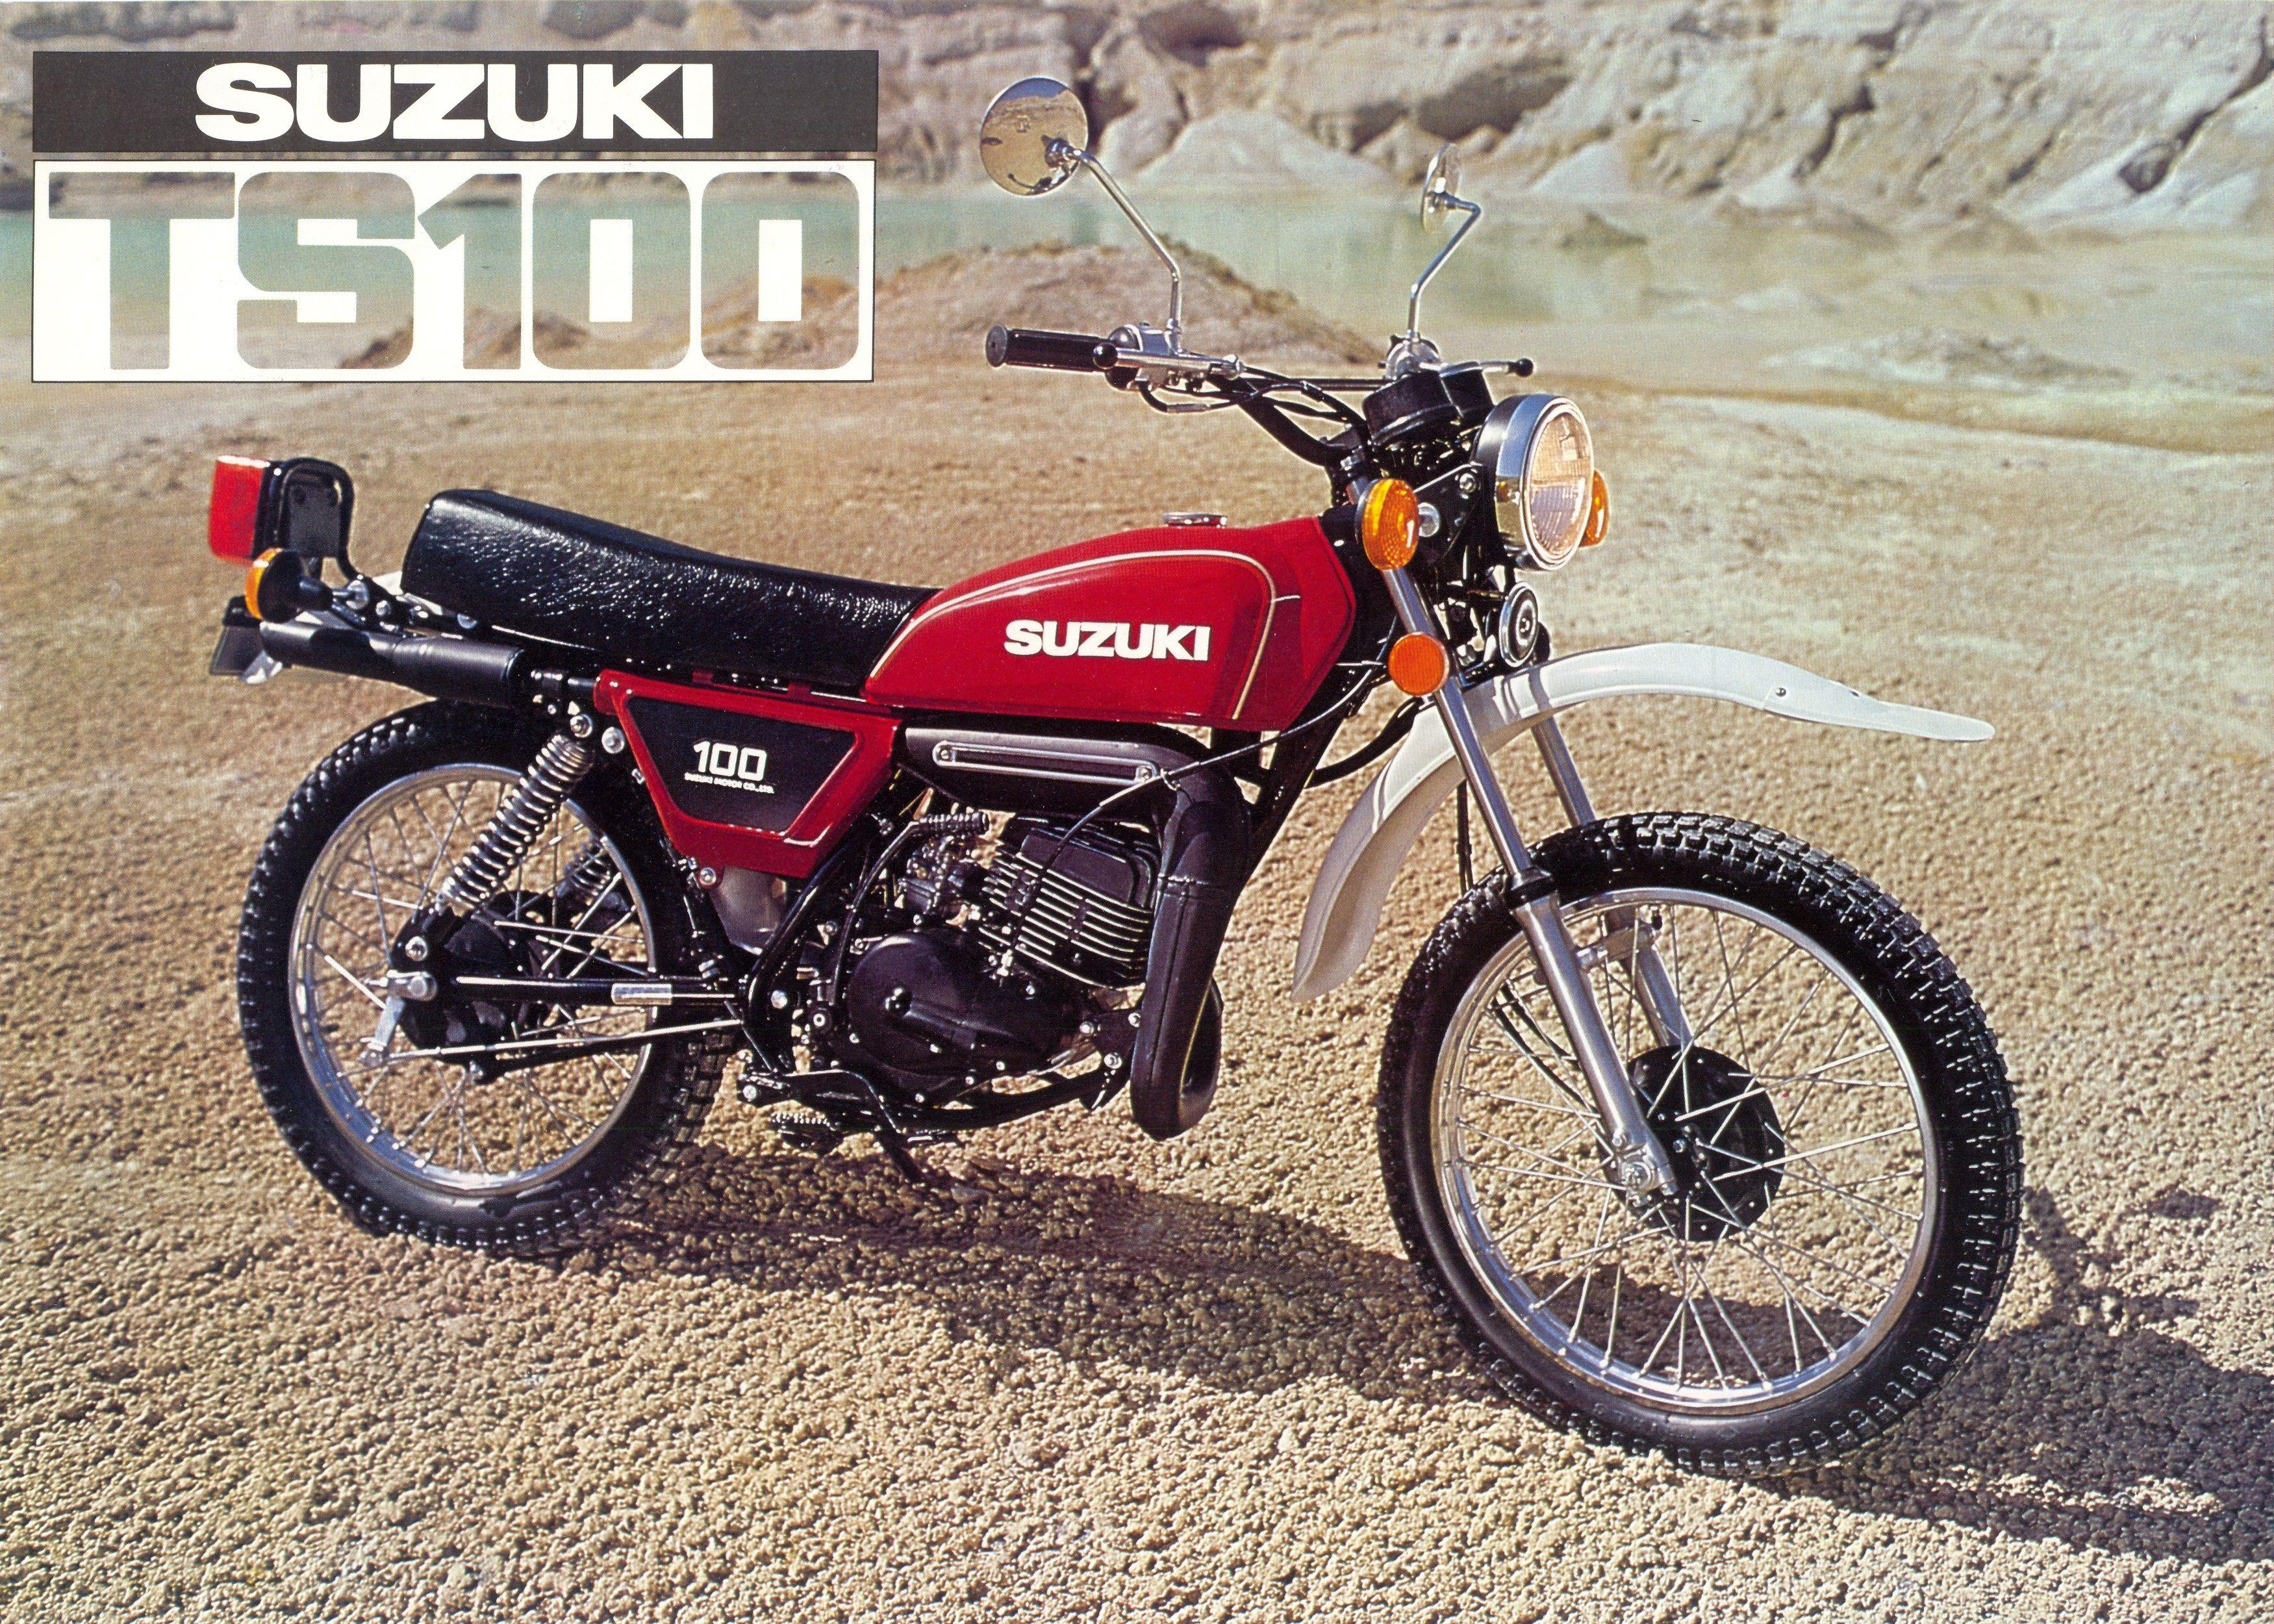 1978 Suzuki TS100C Suzuki, Suzuki motorcycle, Classic bikes